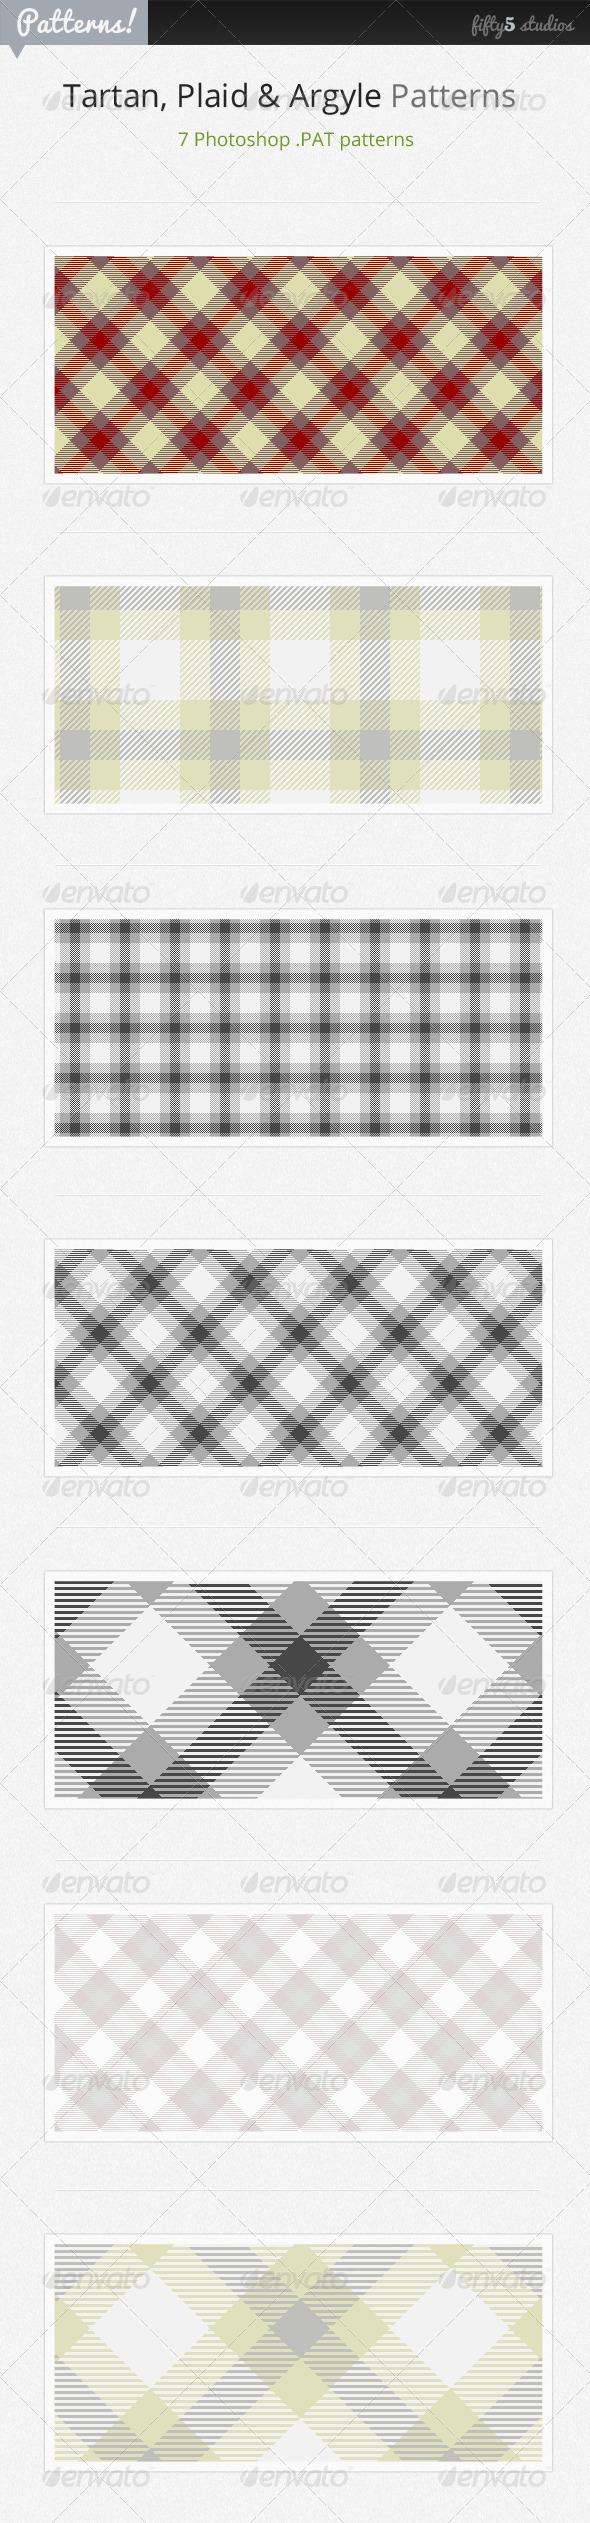 GraphicRiver 7 Tartan Plaid & Arglye Patterns 3376687